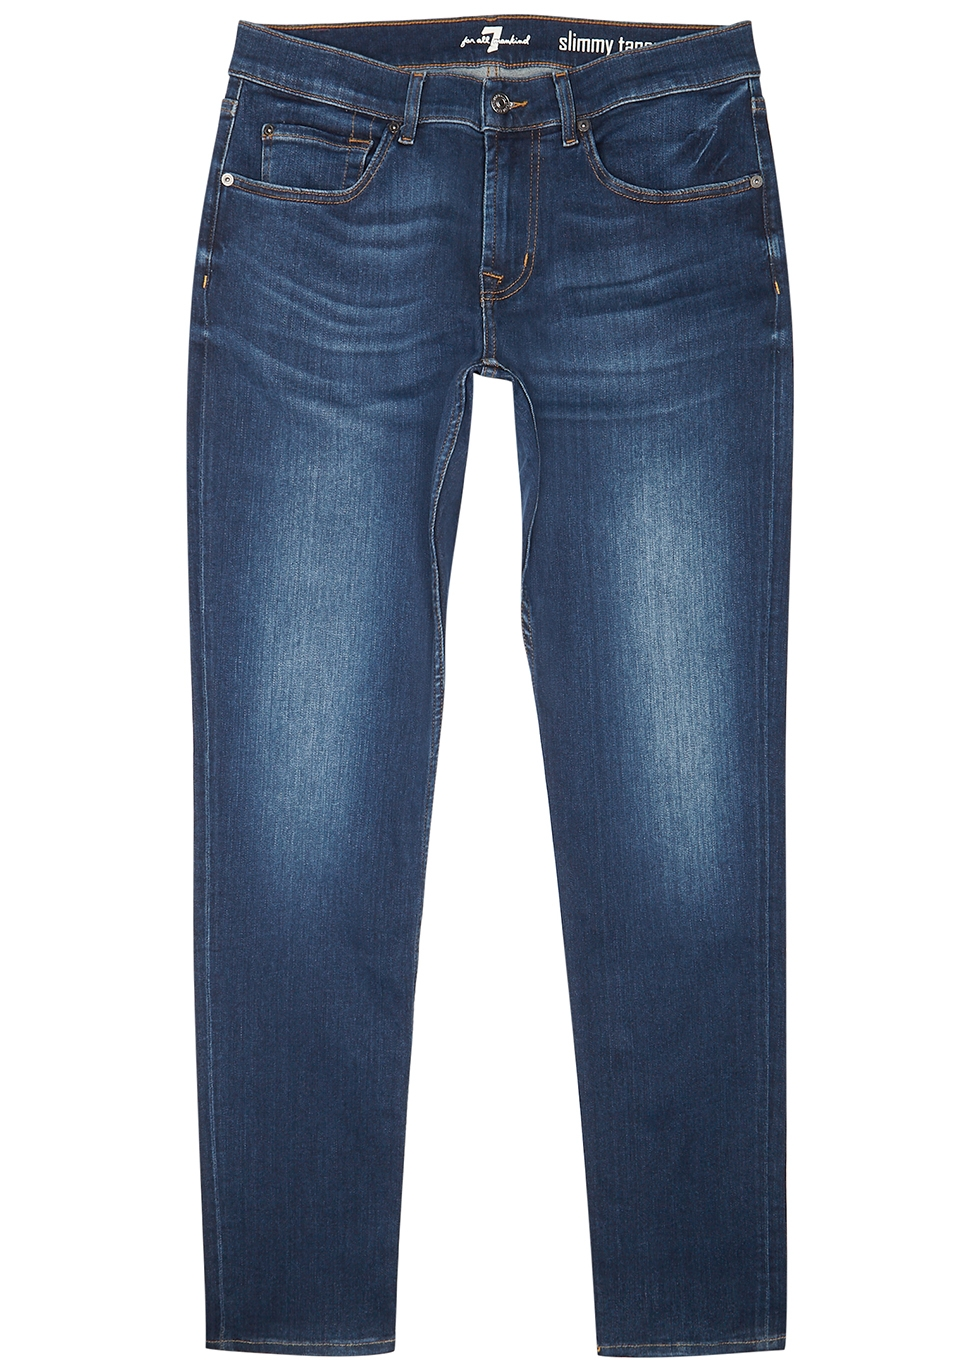 Slimmy tapered slim-leg jeans